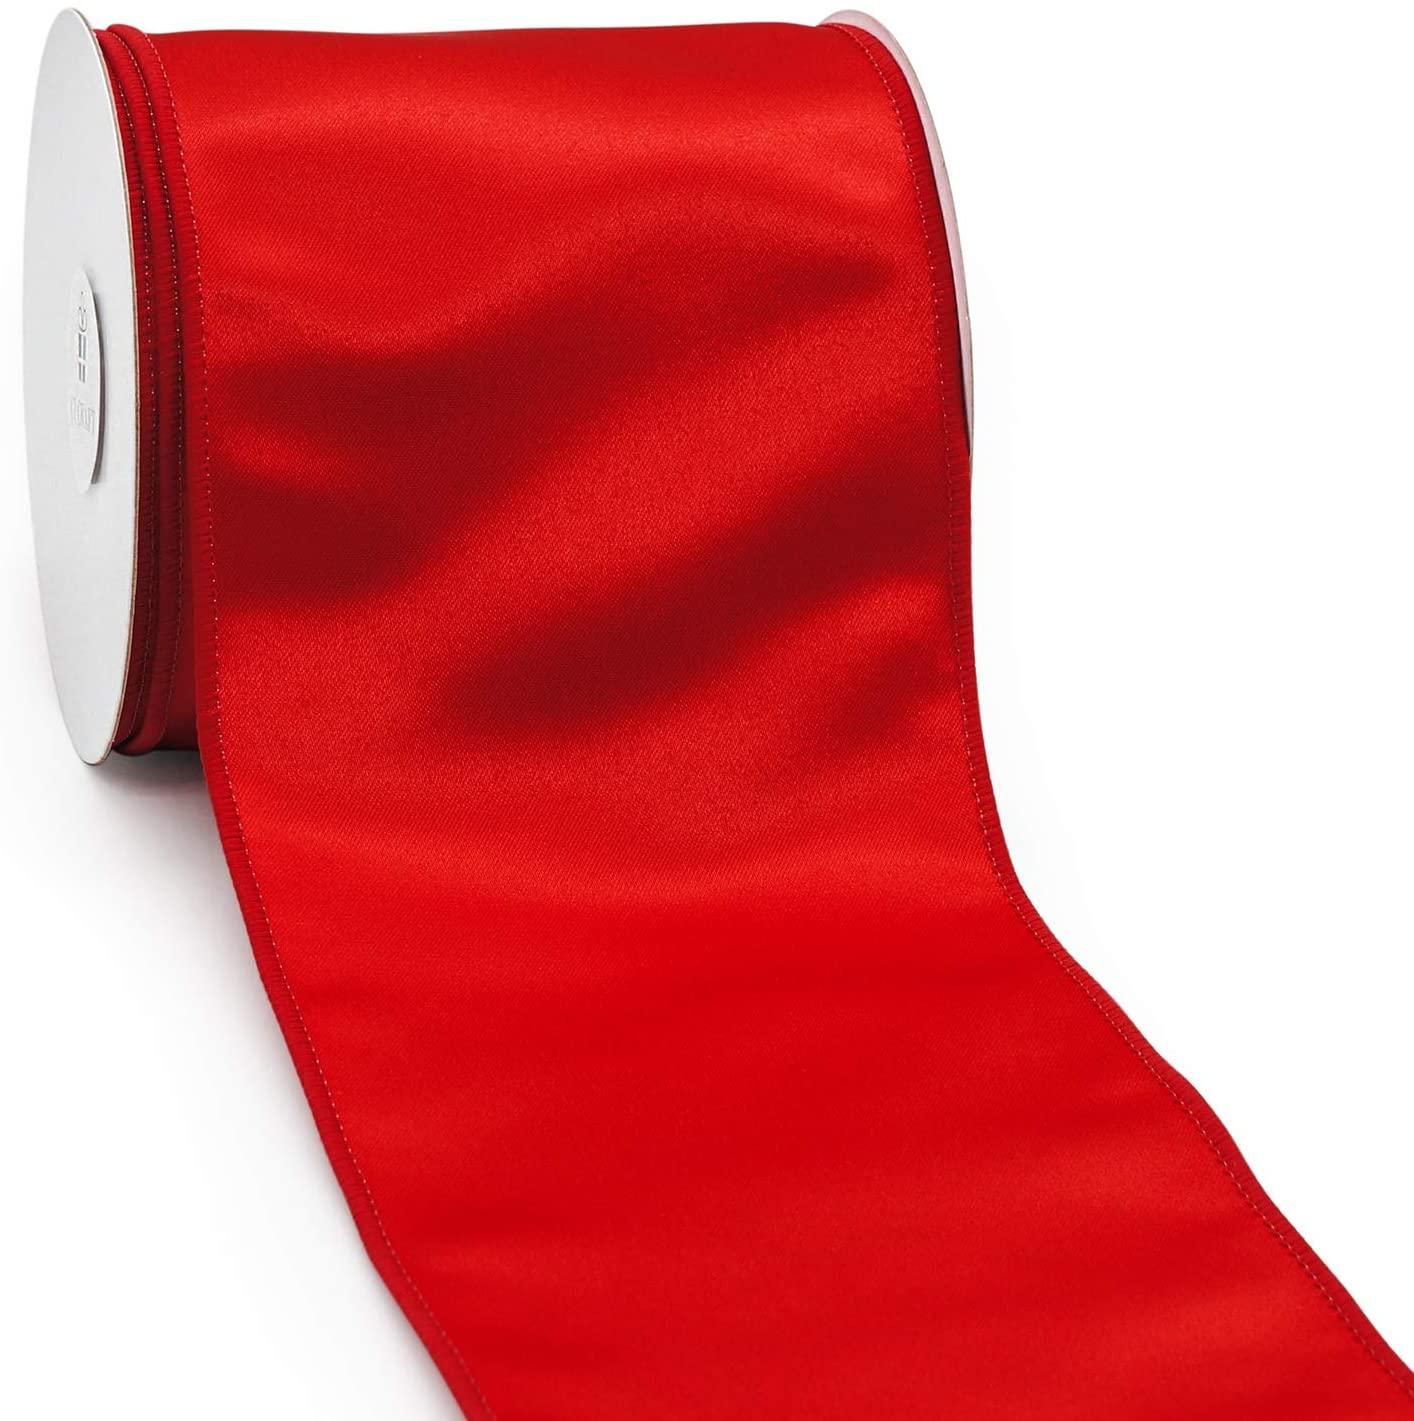 CT CRAFT LLC Satin Wired Ribbon - 4 Inch x 10 Yards - Red